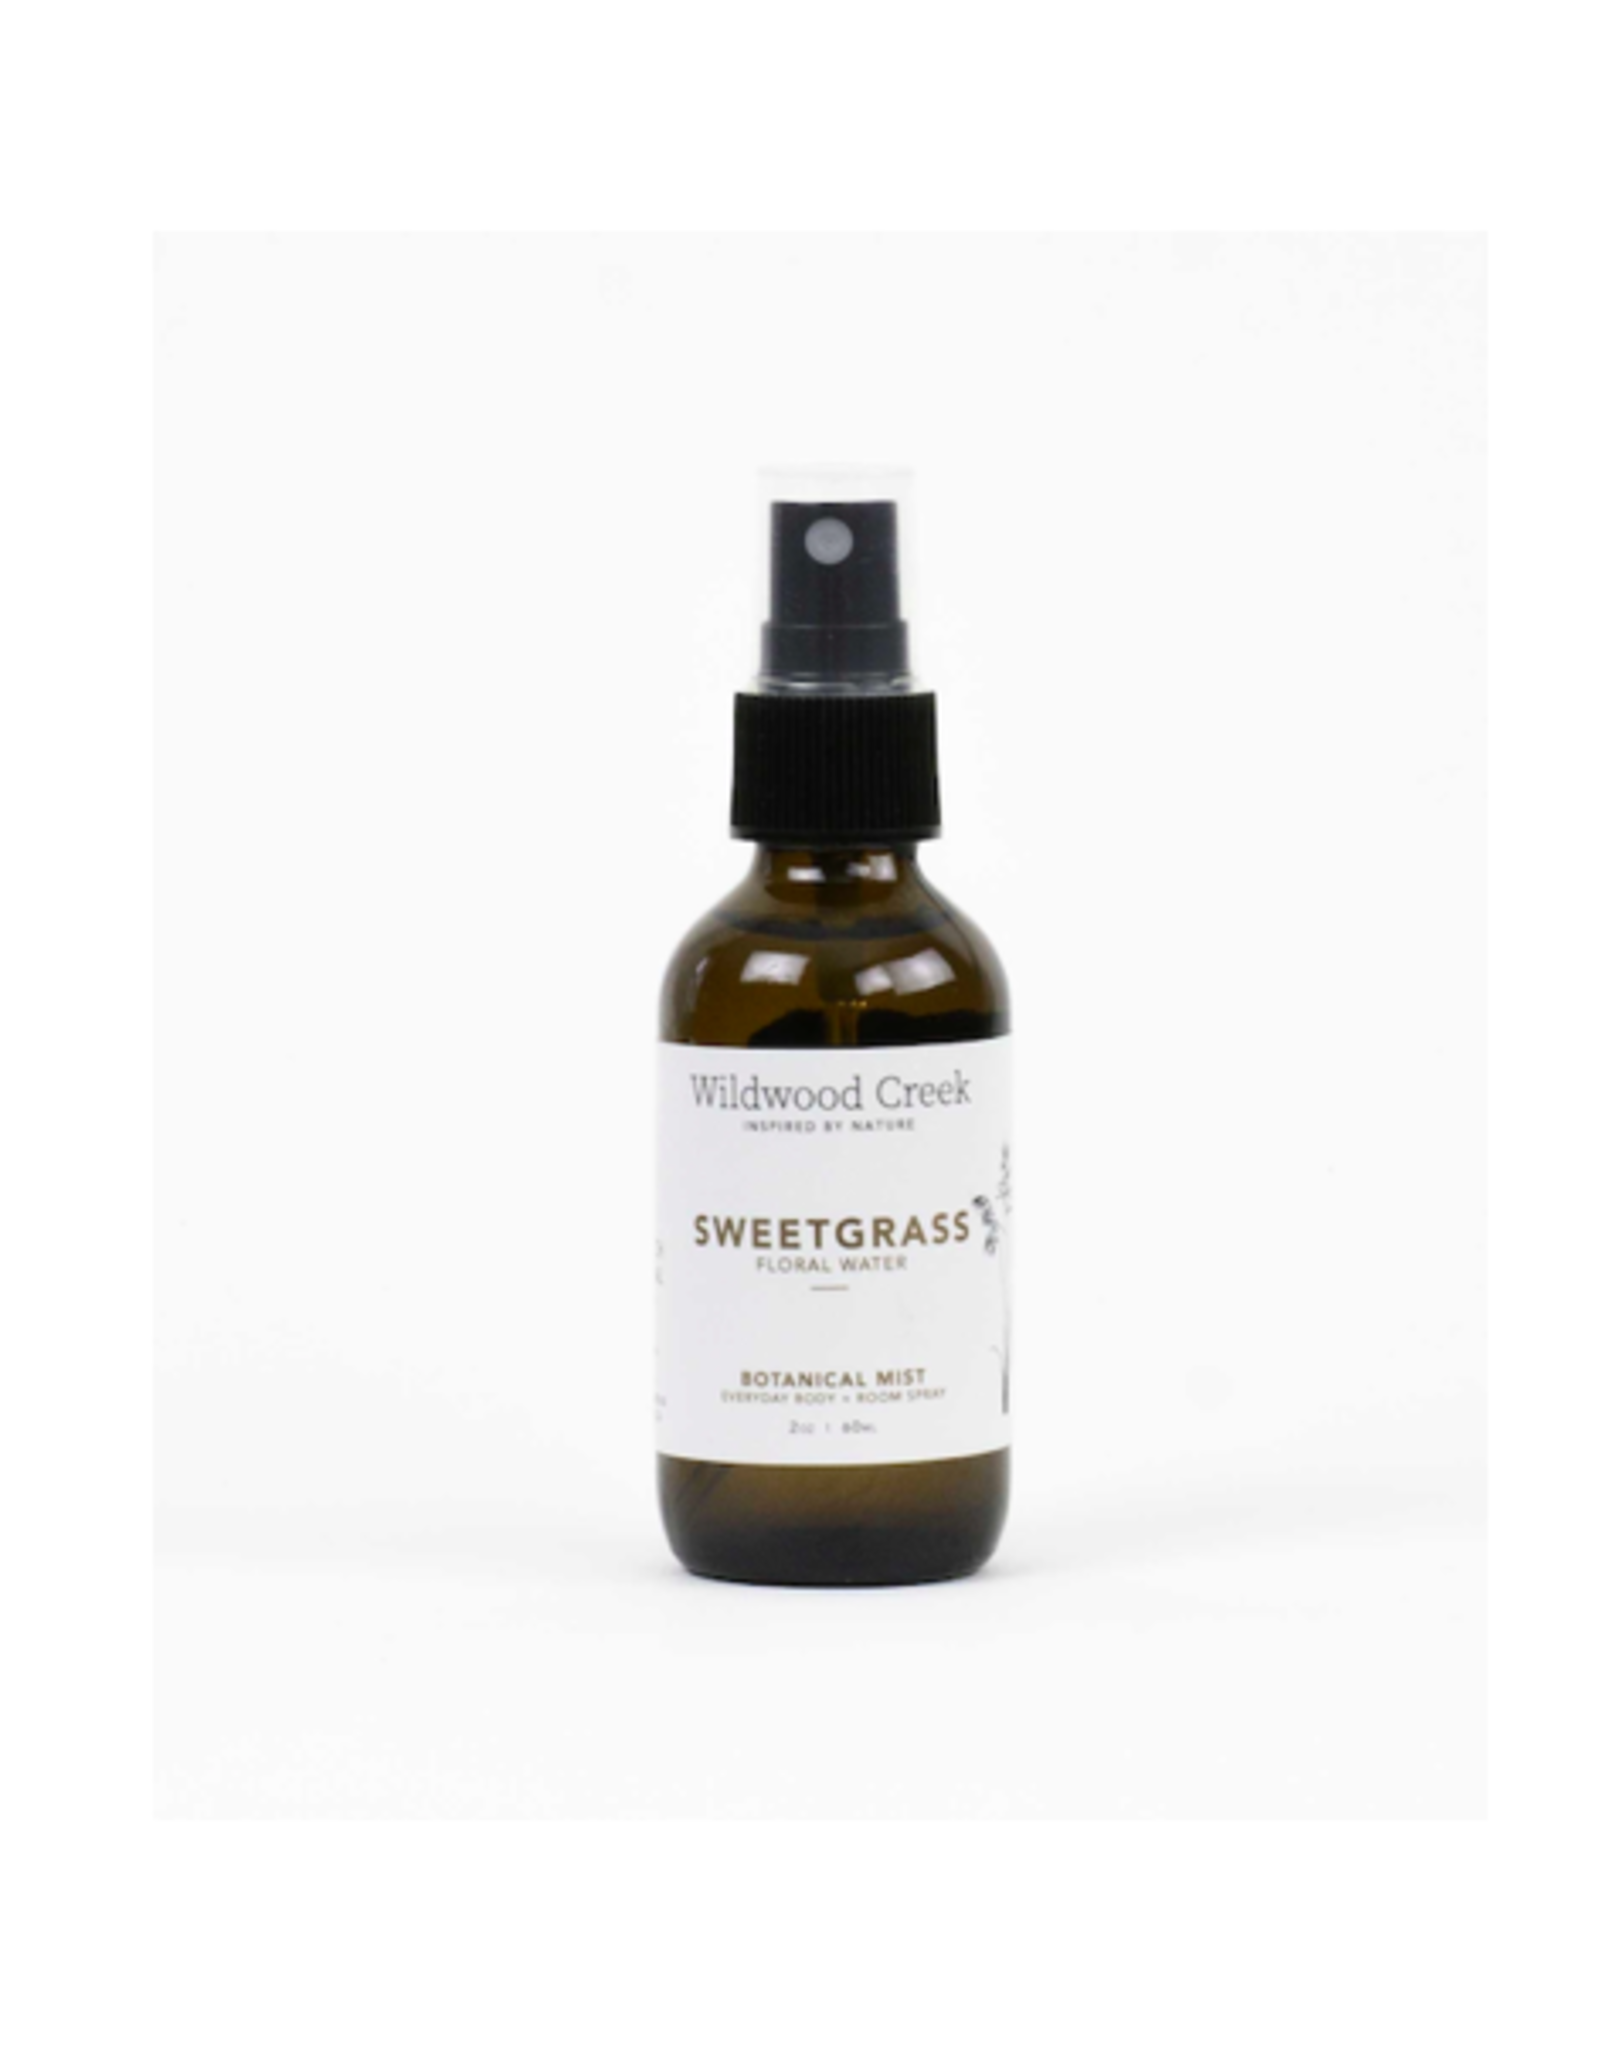 Wildwood Creek - Mist / Sweetgrass, 2oz